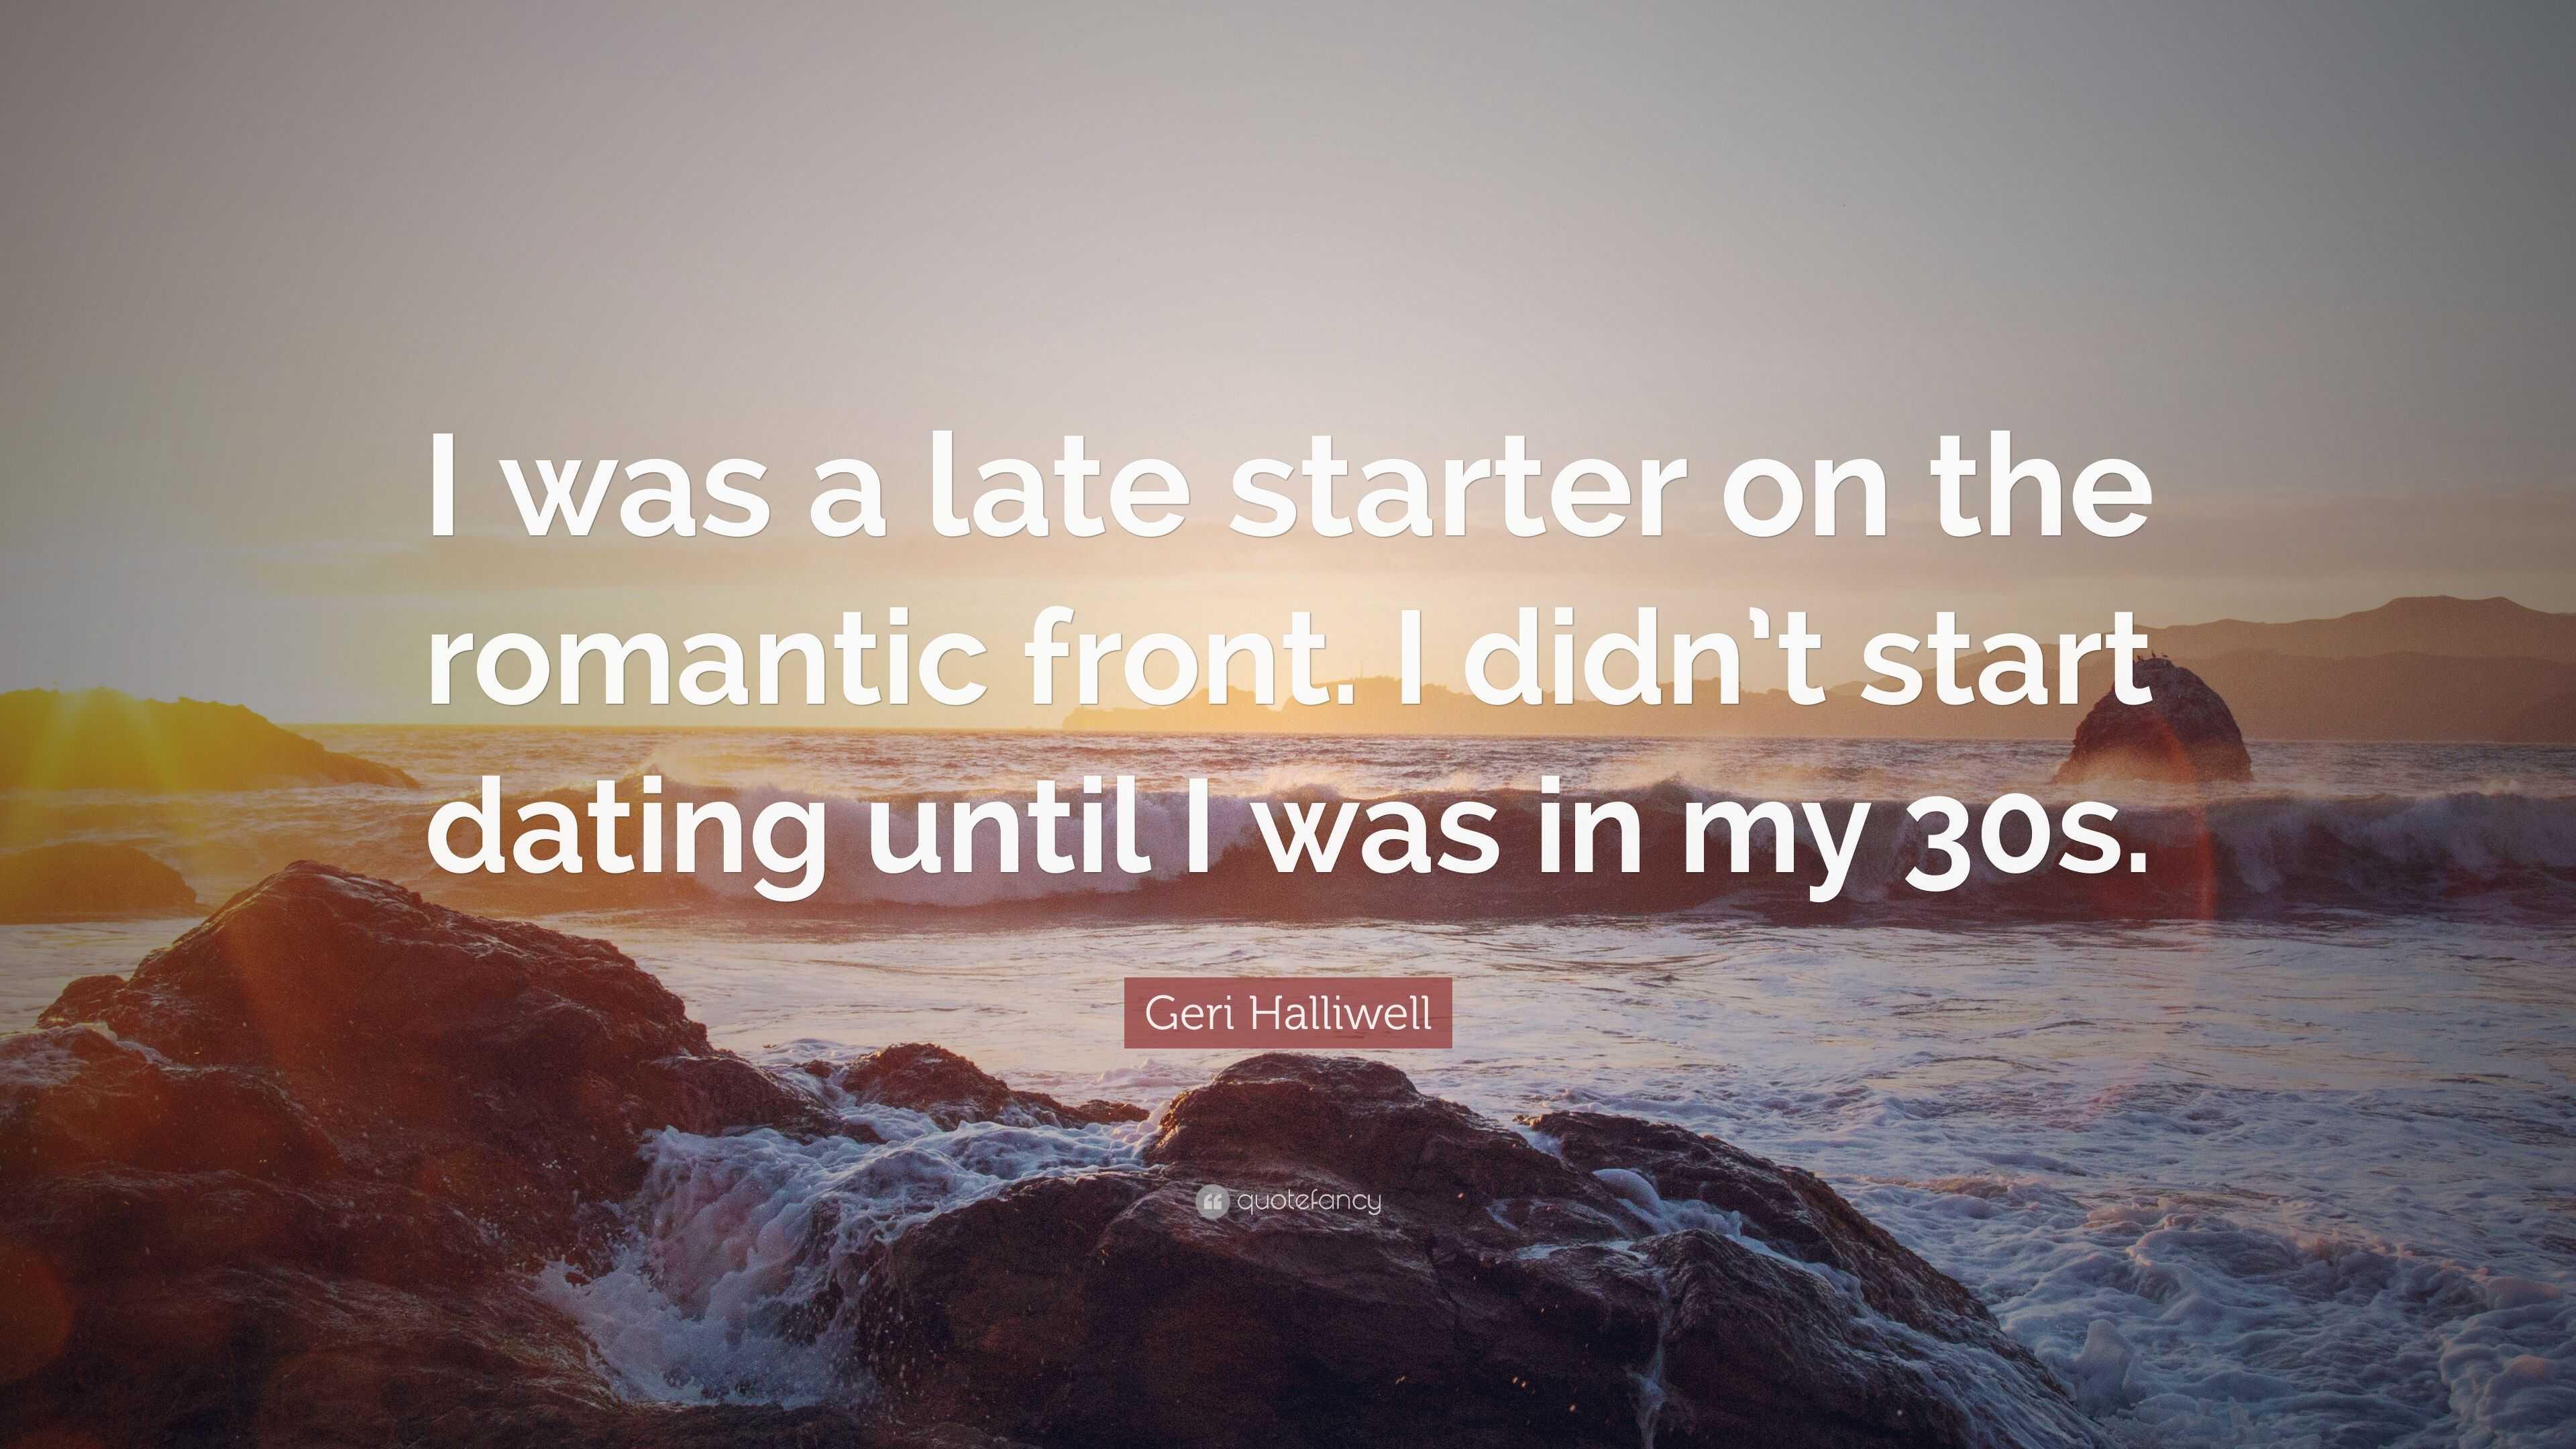 start dating in 30s